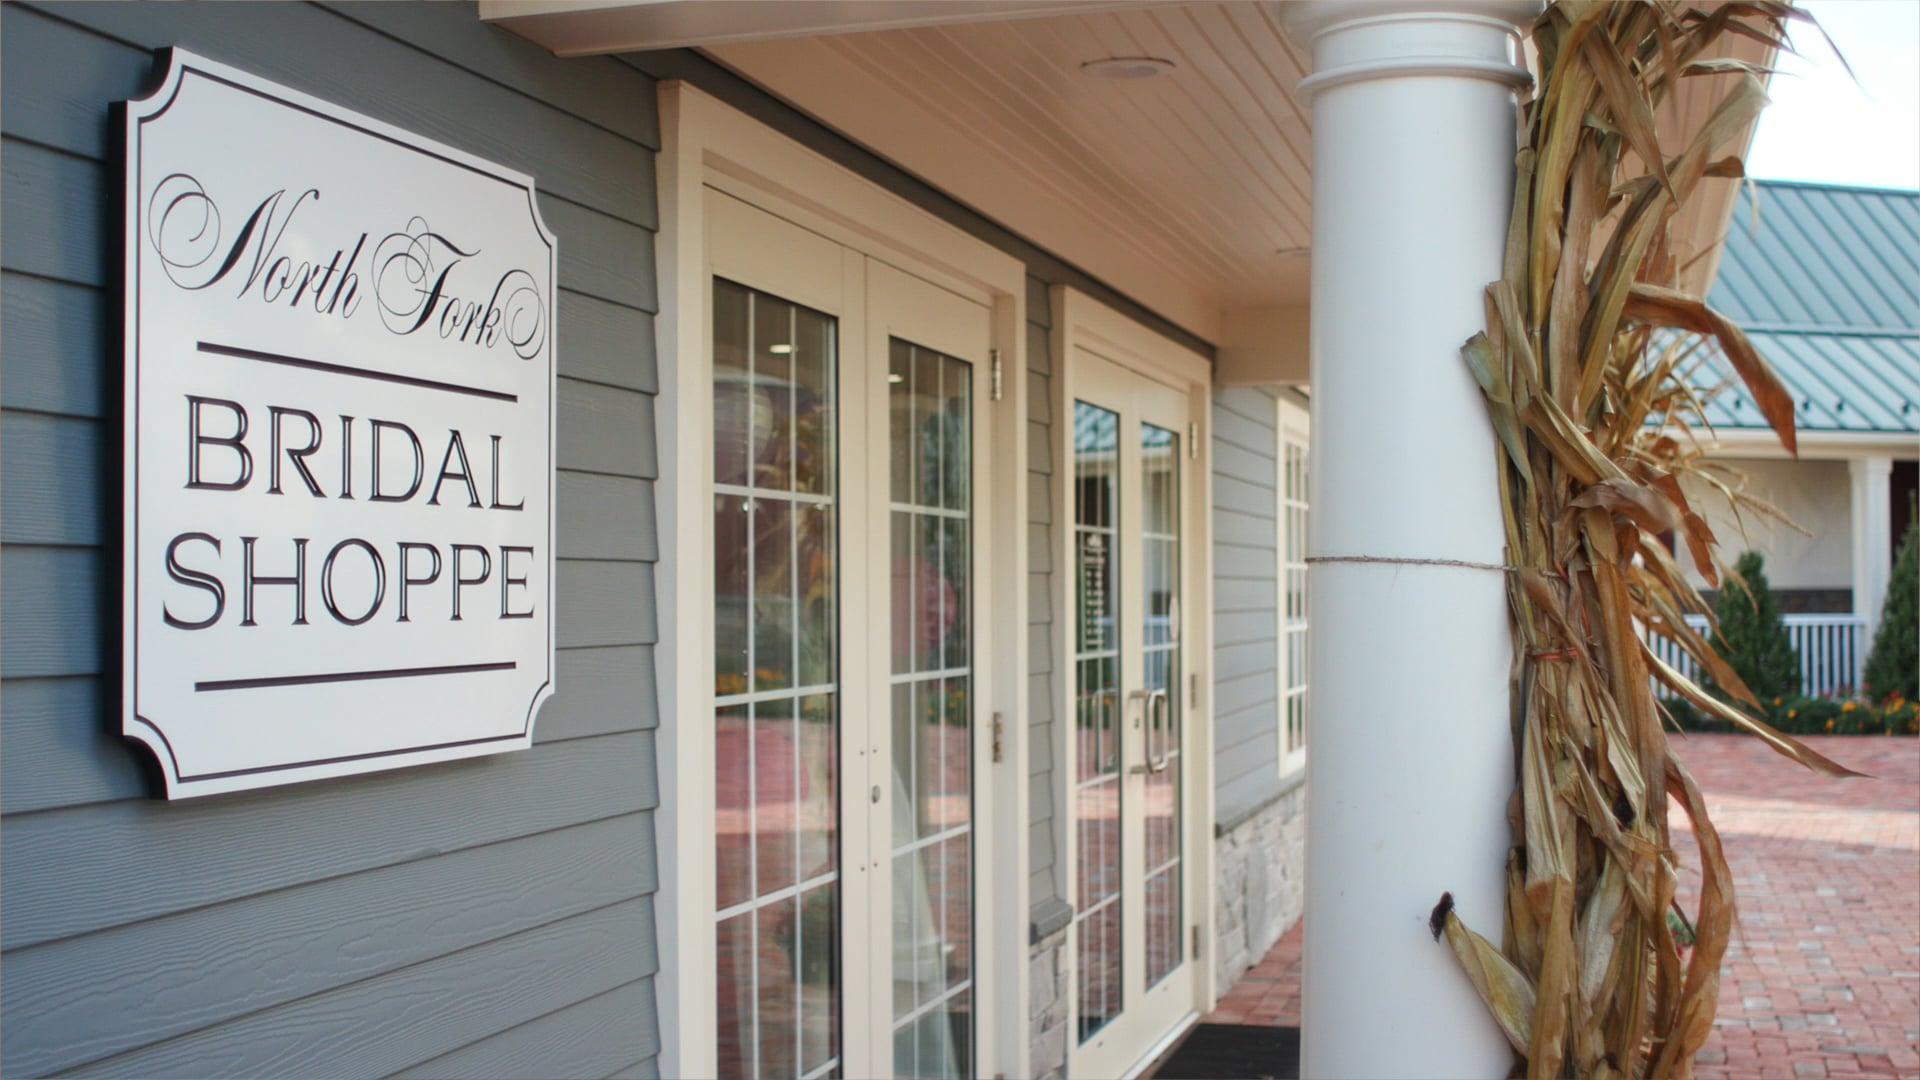 North Fork Bridal Shoppe